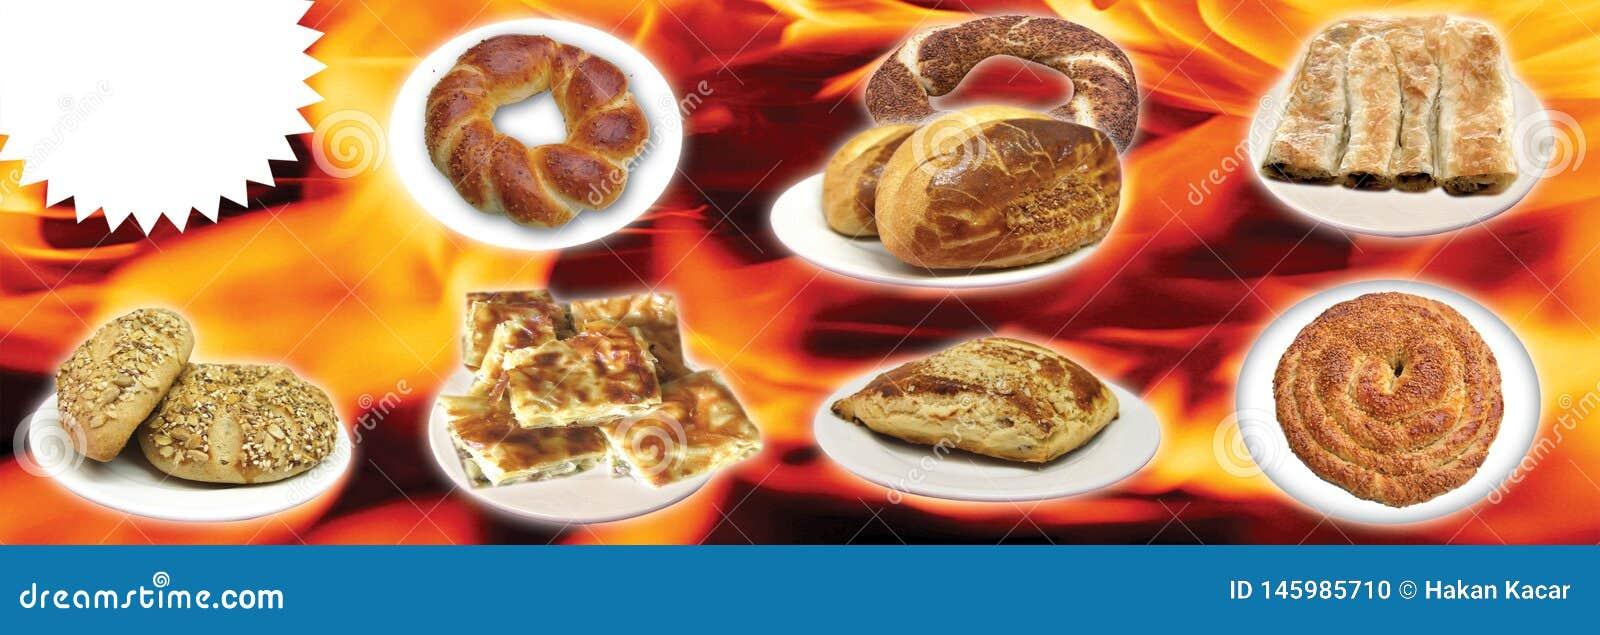 Het Turkse voedsel, Turks spreekt: rk yemekleri tà ¼, doner,